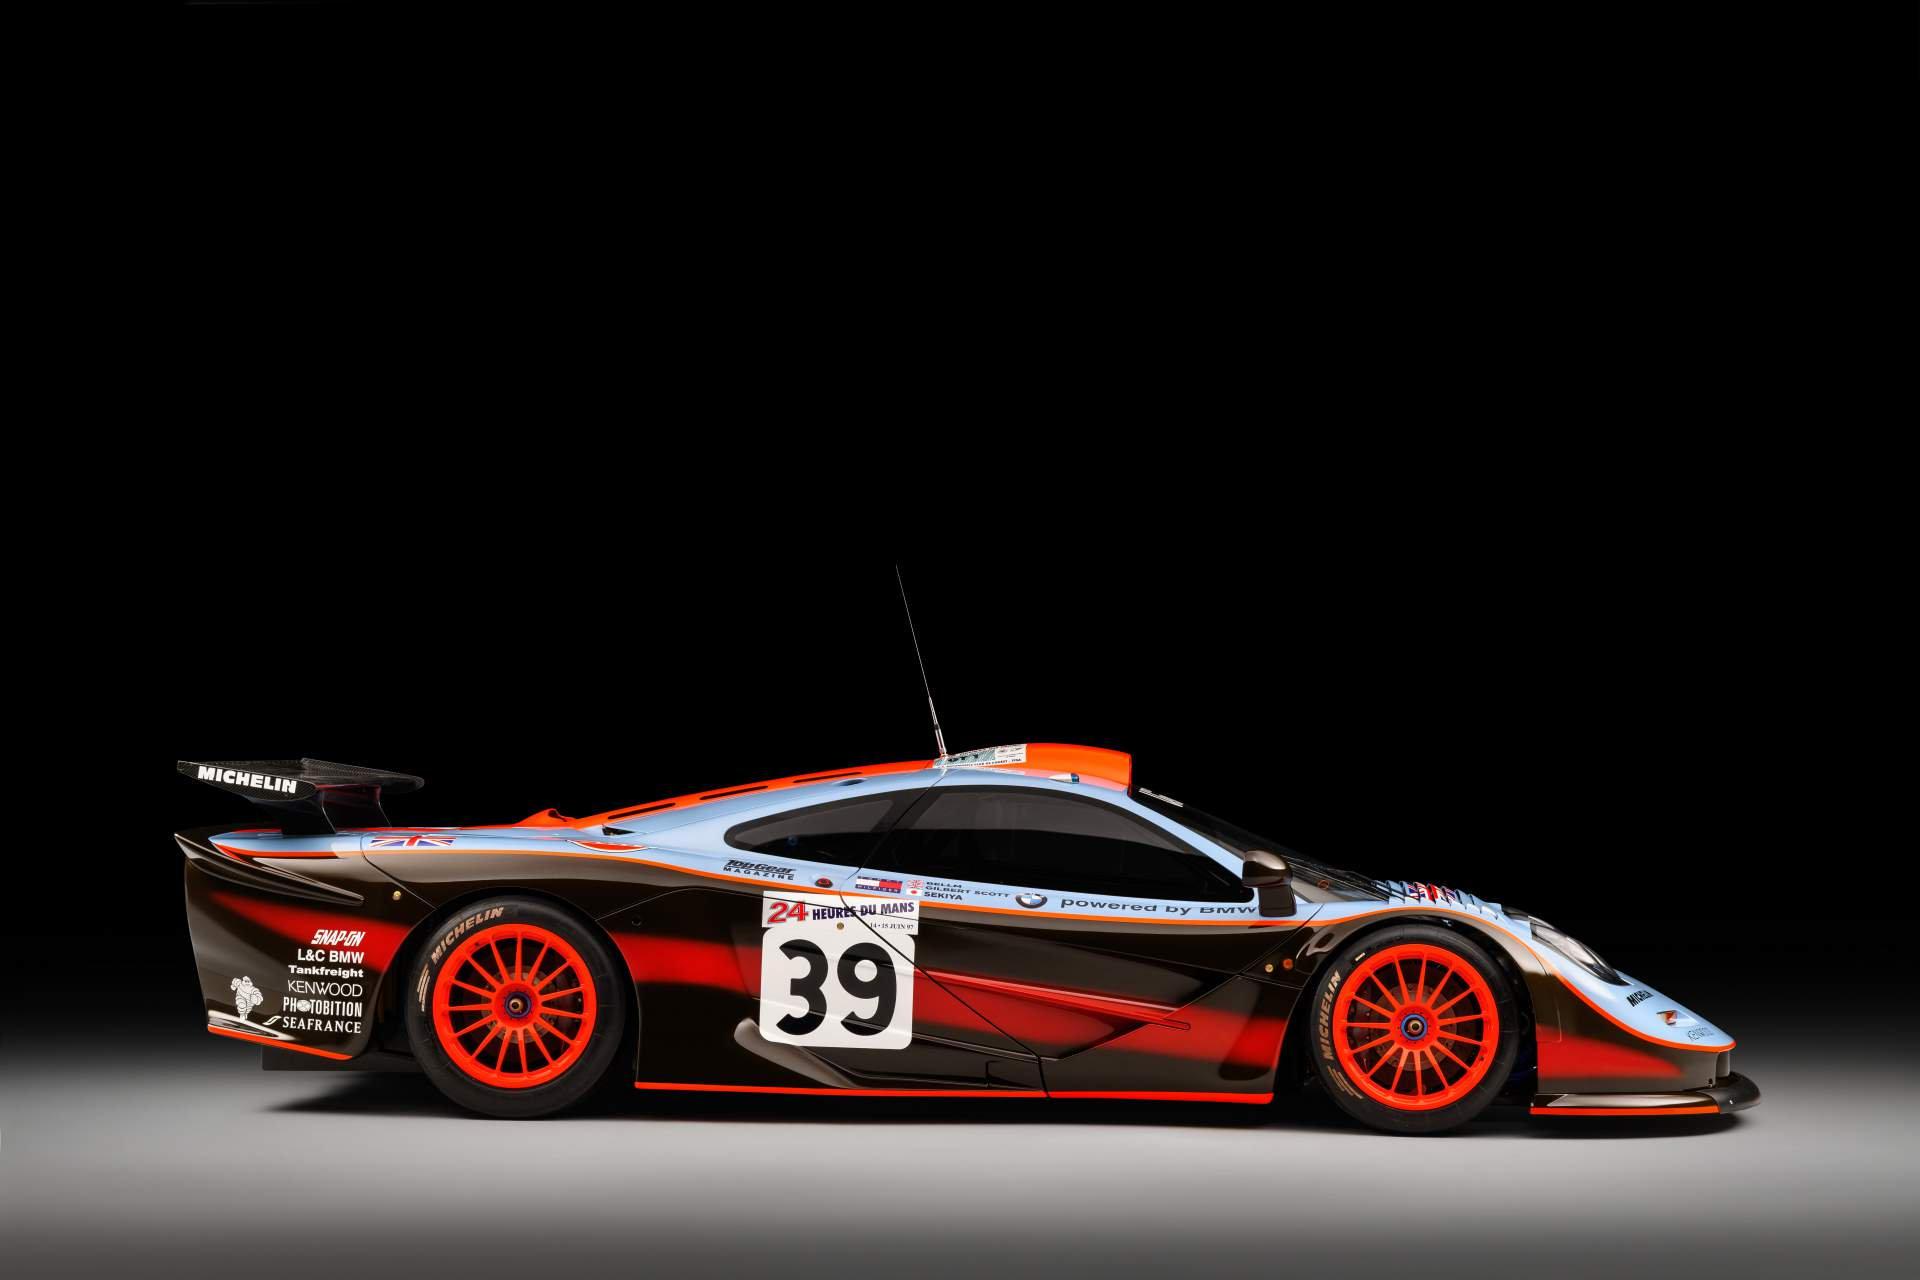 McLaren F1 GTR Longtail 25R restored by MSO (5)